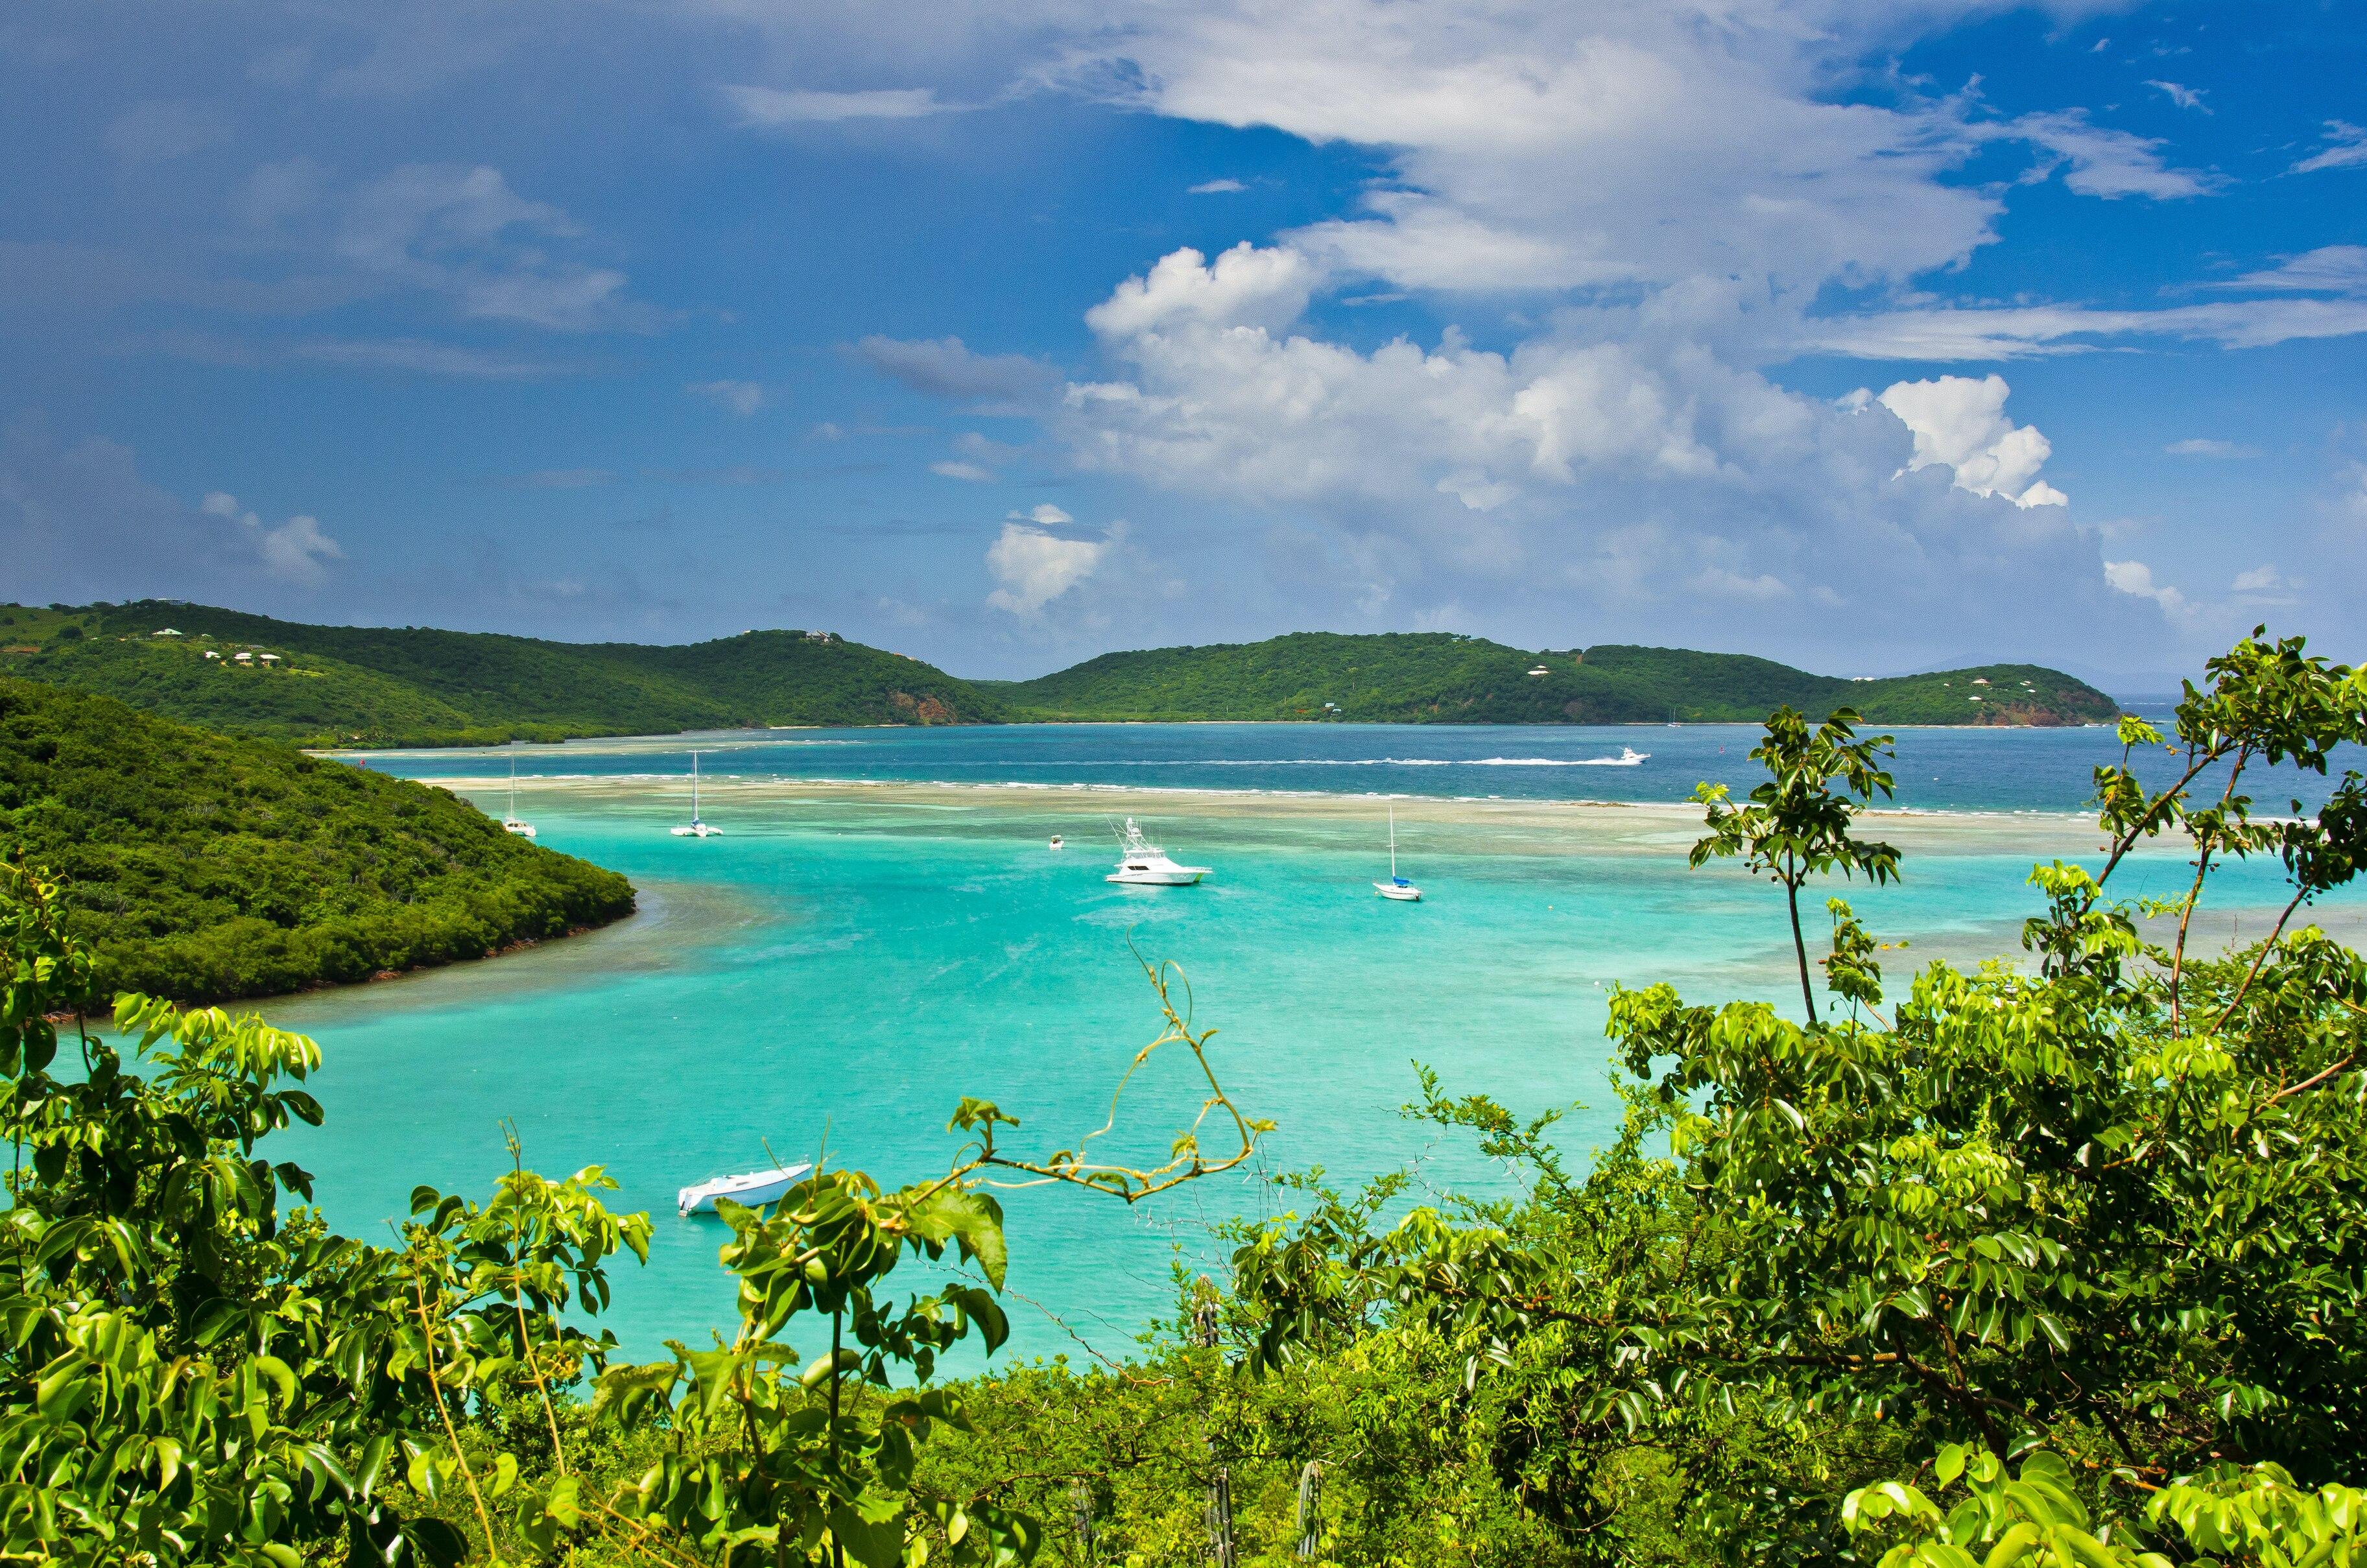 Karibik-Insel Culebra